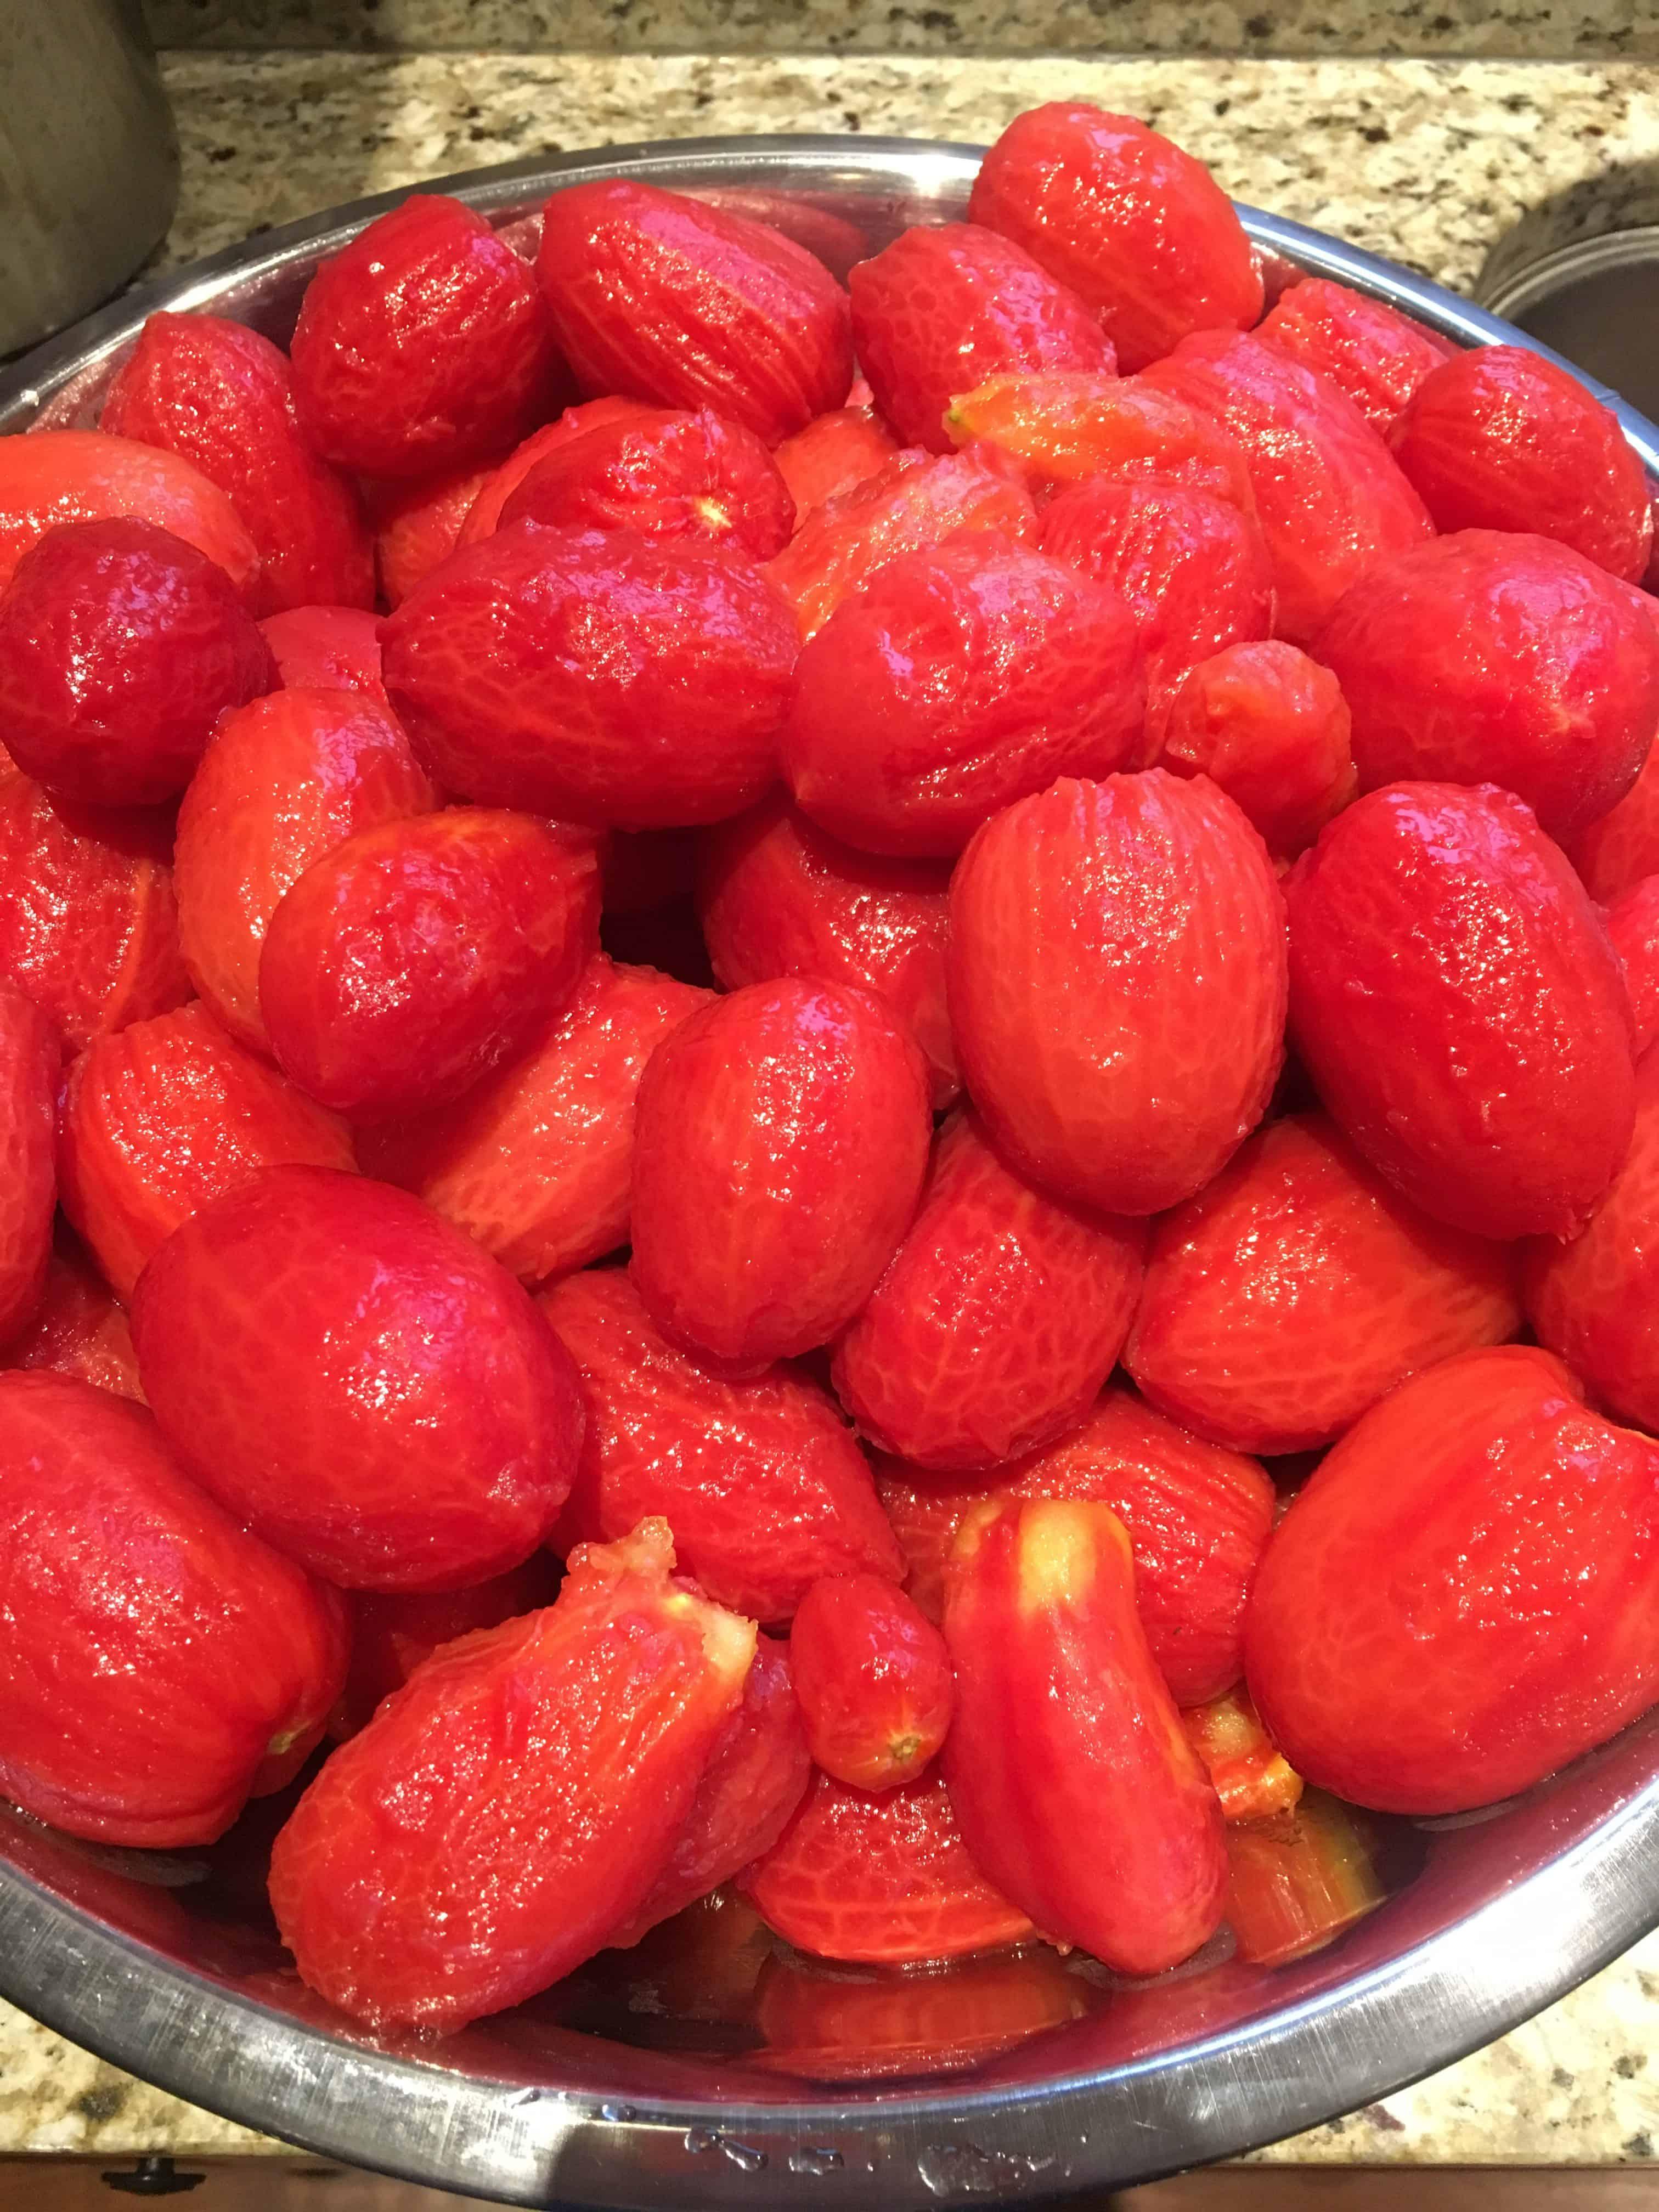 Peeled Roma and San Marzano tomatoes. https://trimazing.com